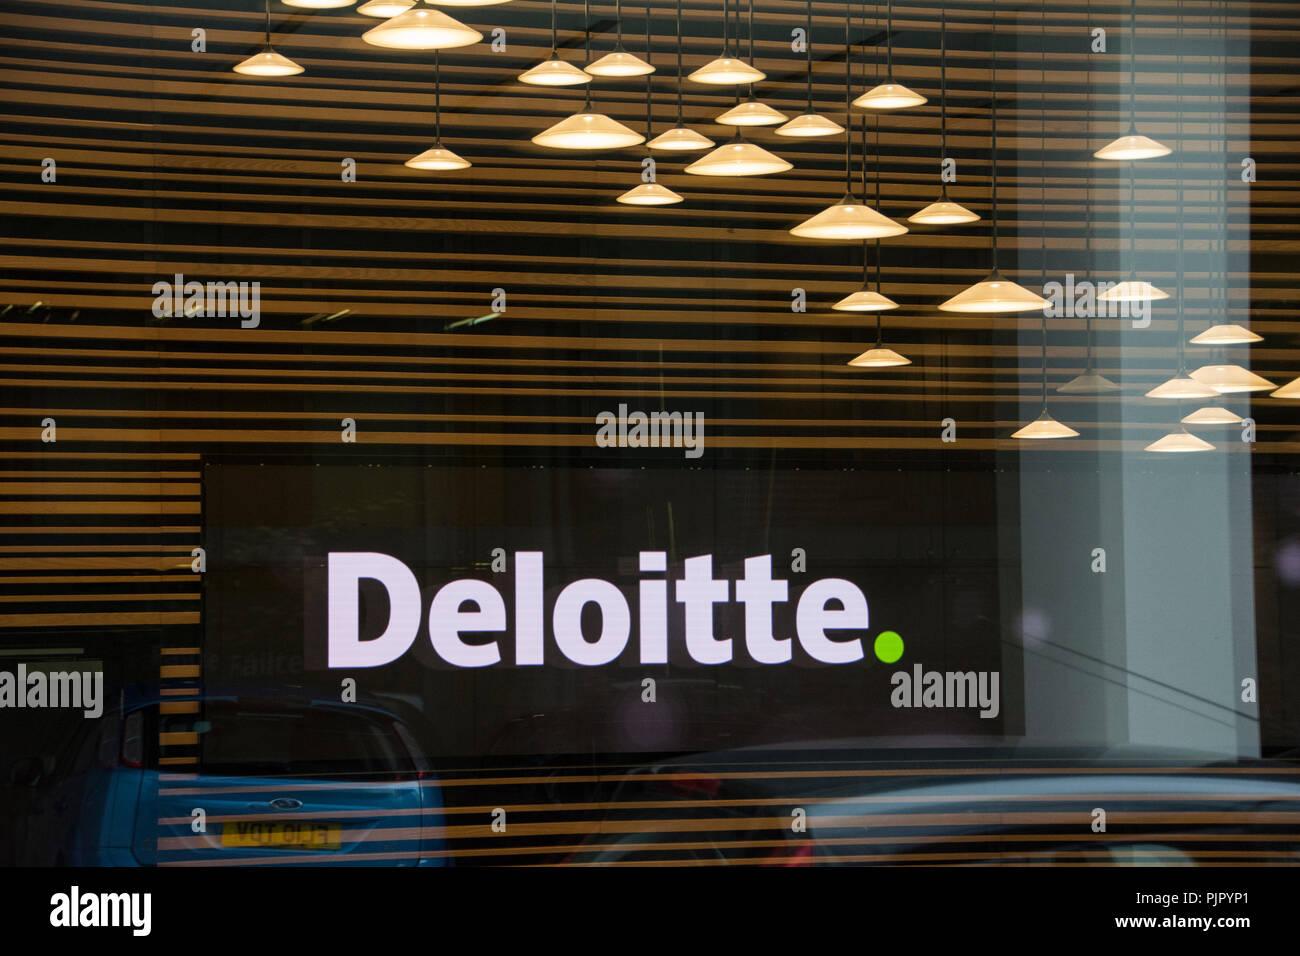 New Deloitte Headquarters, Stonecutter Court, City of London, UK Stock Photo